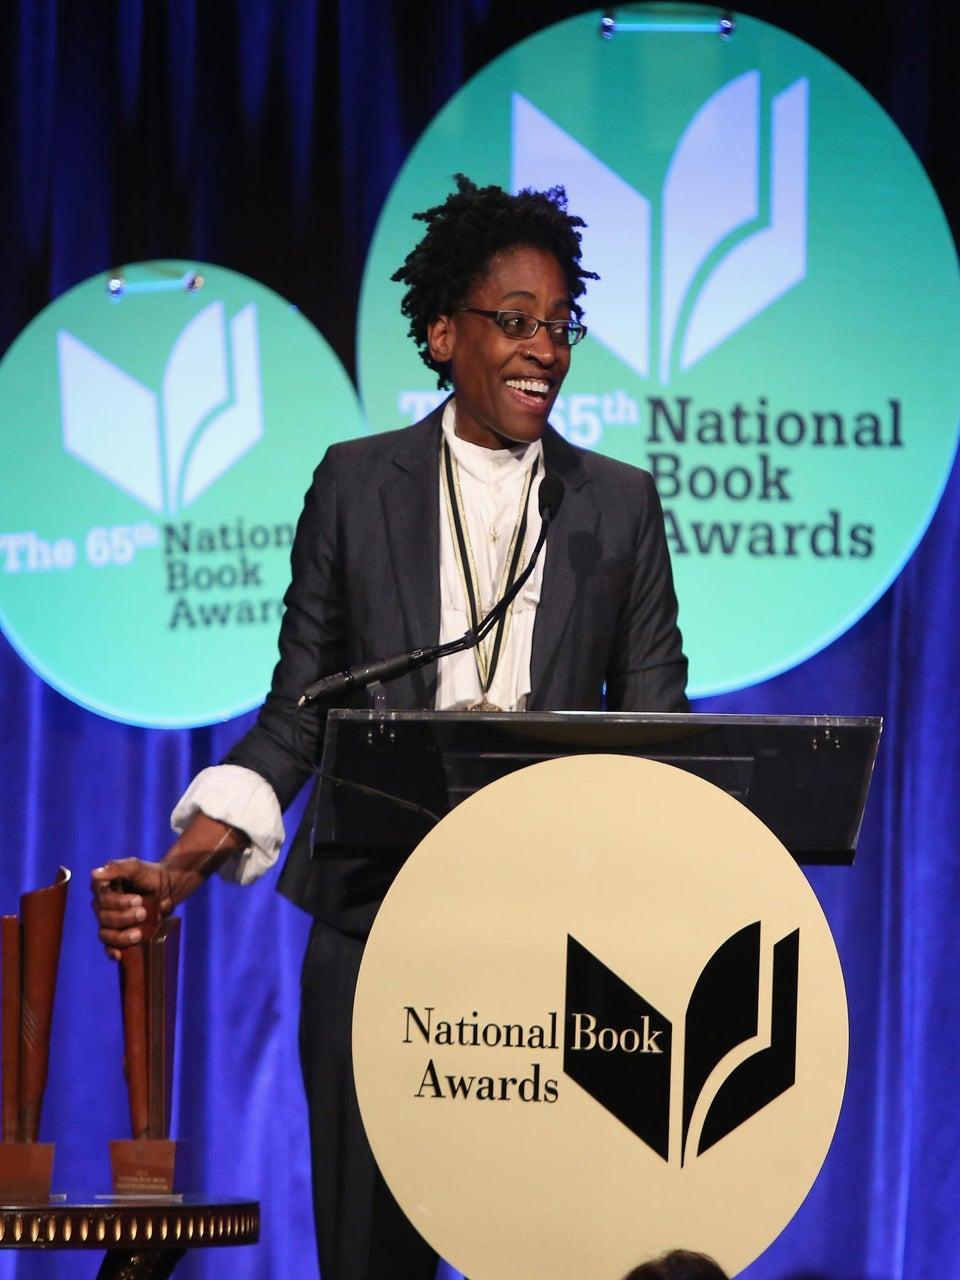 Children's Book Author Jacqueline Woodson Wins National Book Award